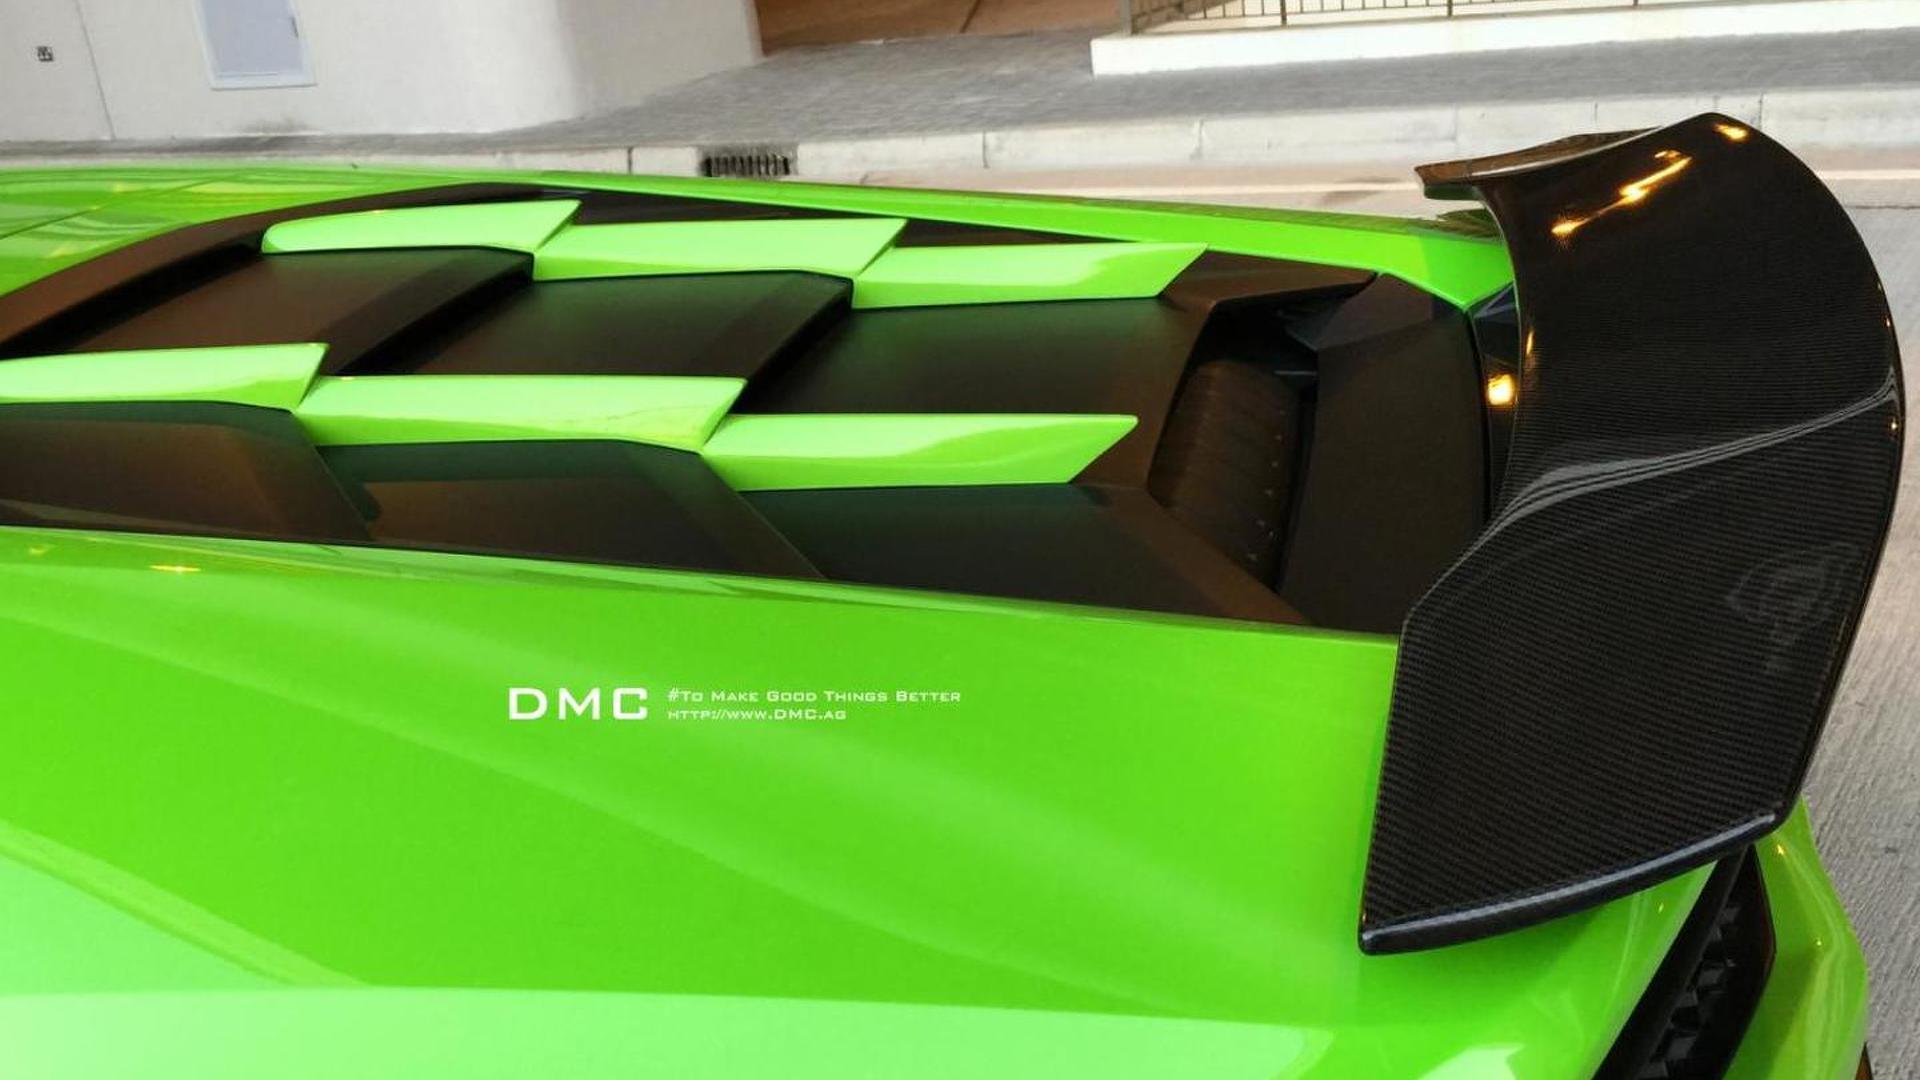 Крышка моторного отсека Lamborghini Huracan Affari от DMC Tuning